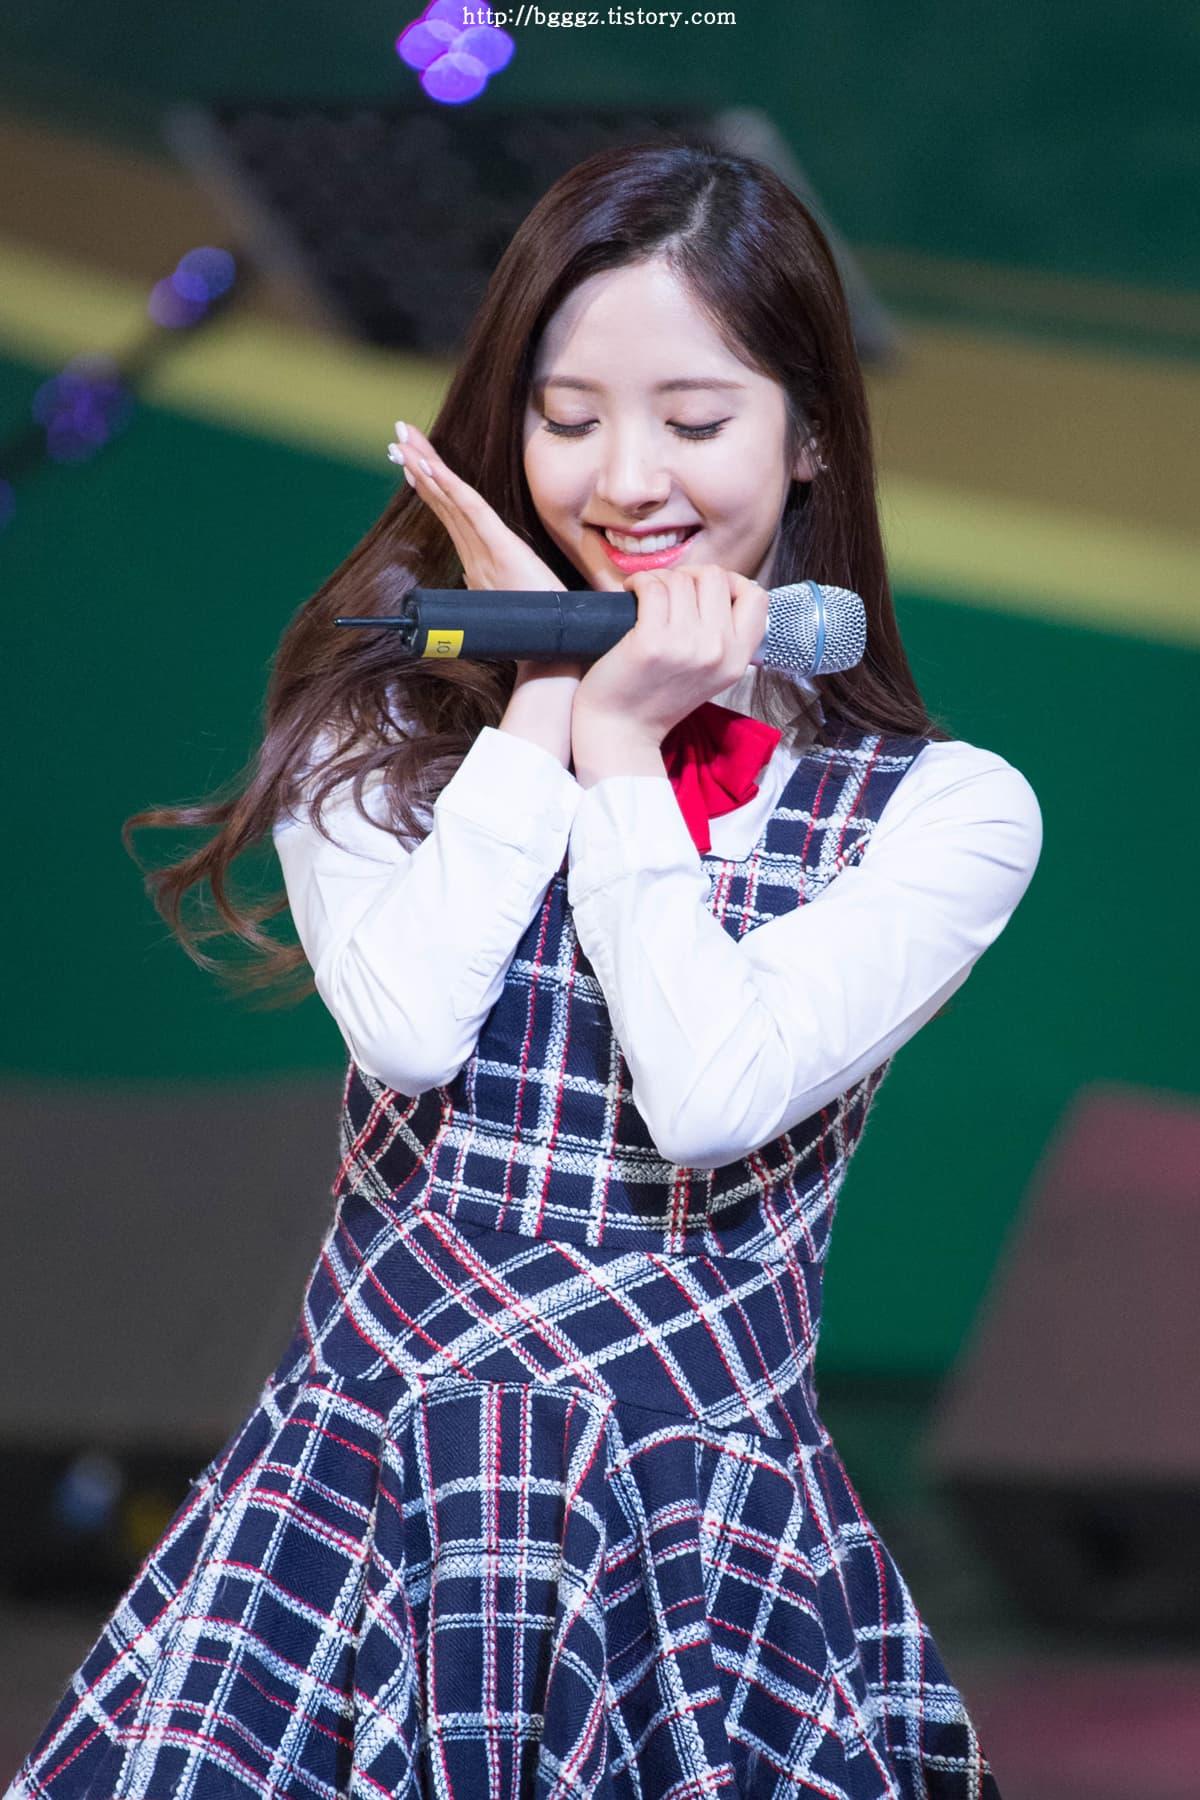 170228 WJSN - The 23rd Korean Entertainment Arts Awards - 163p